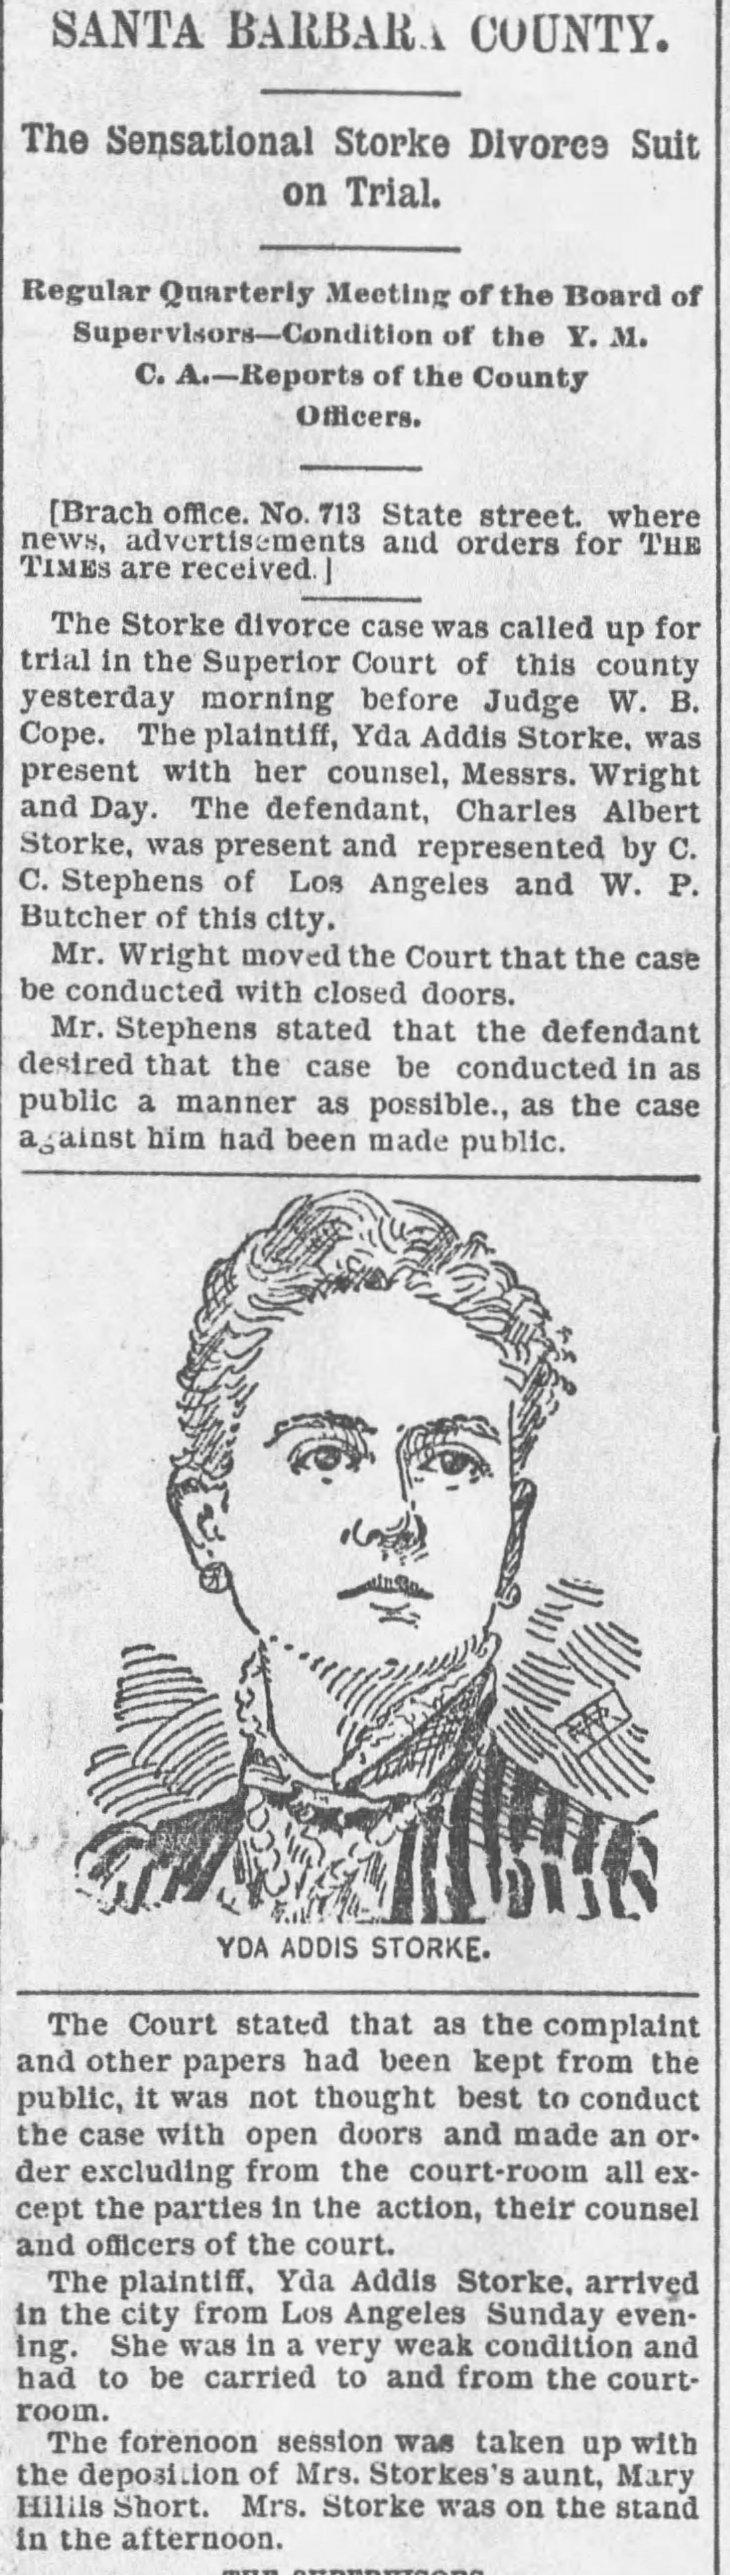 Yda image divorce suit The_Los_Angeles_Times_Tue__Jan_5__1892_